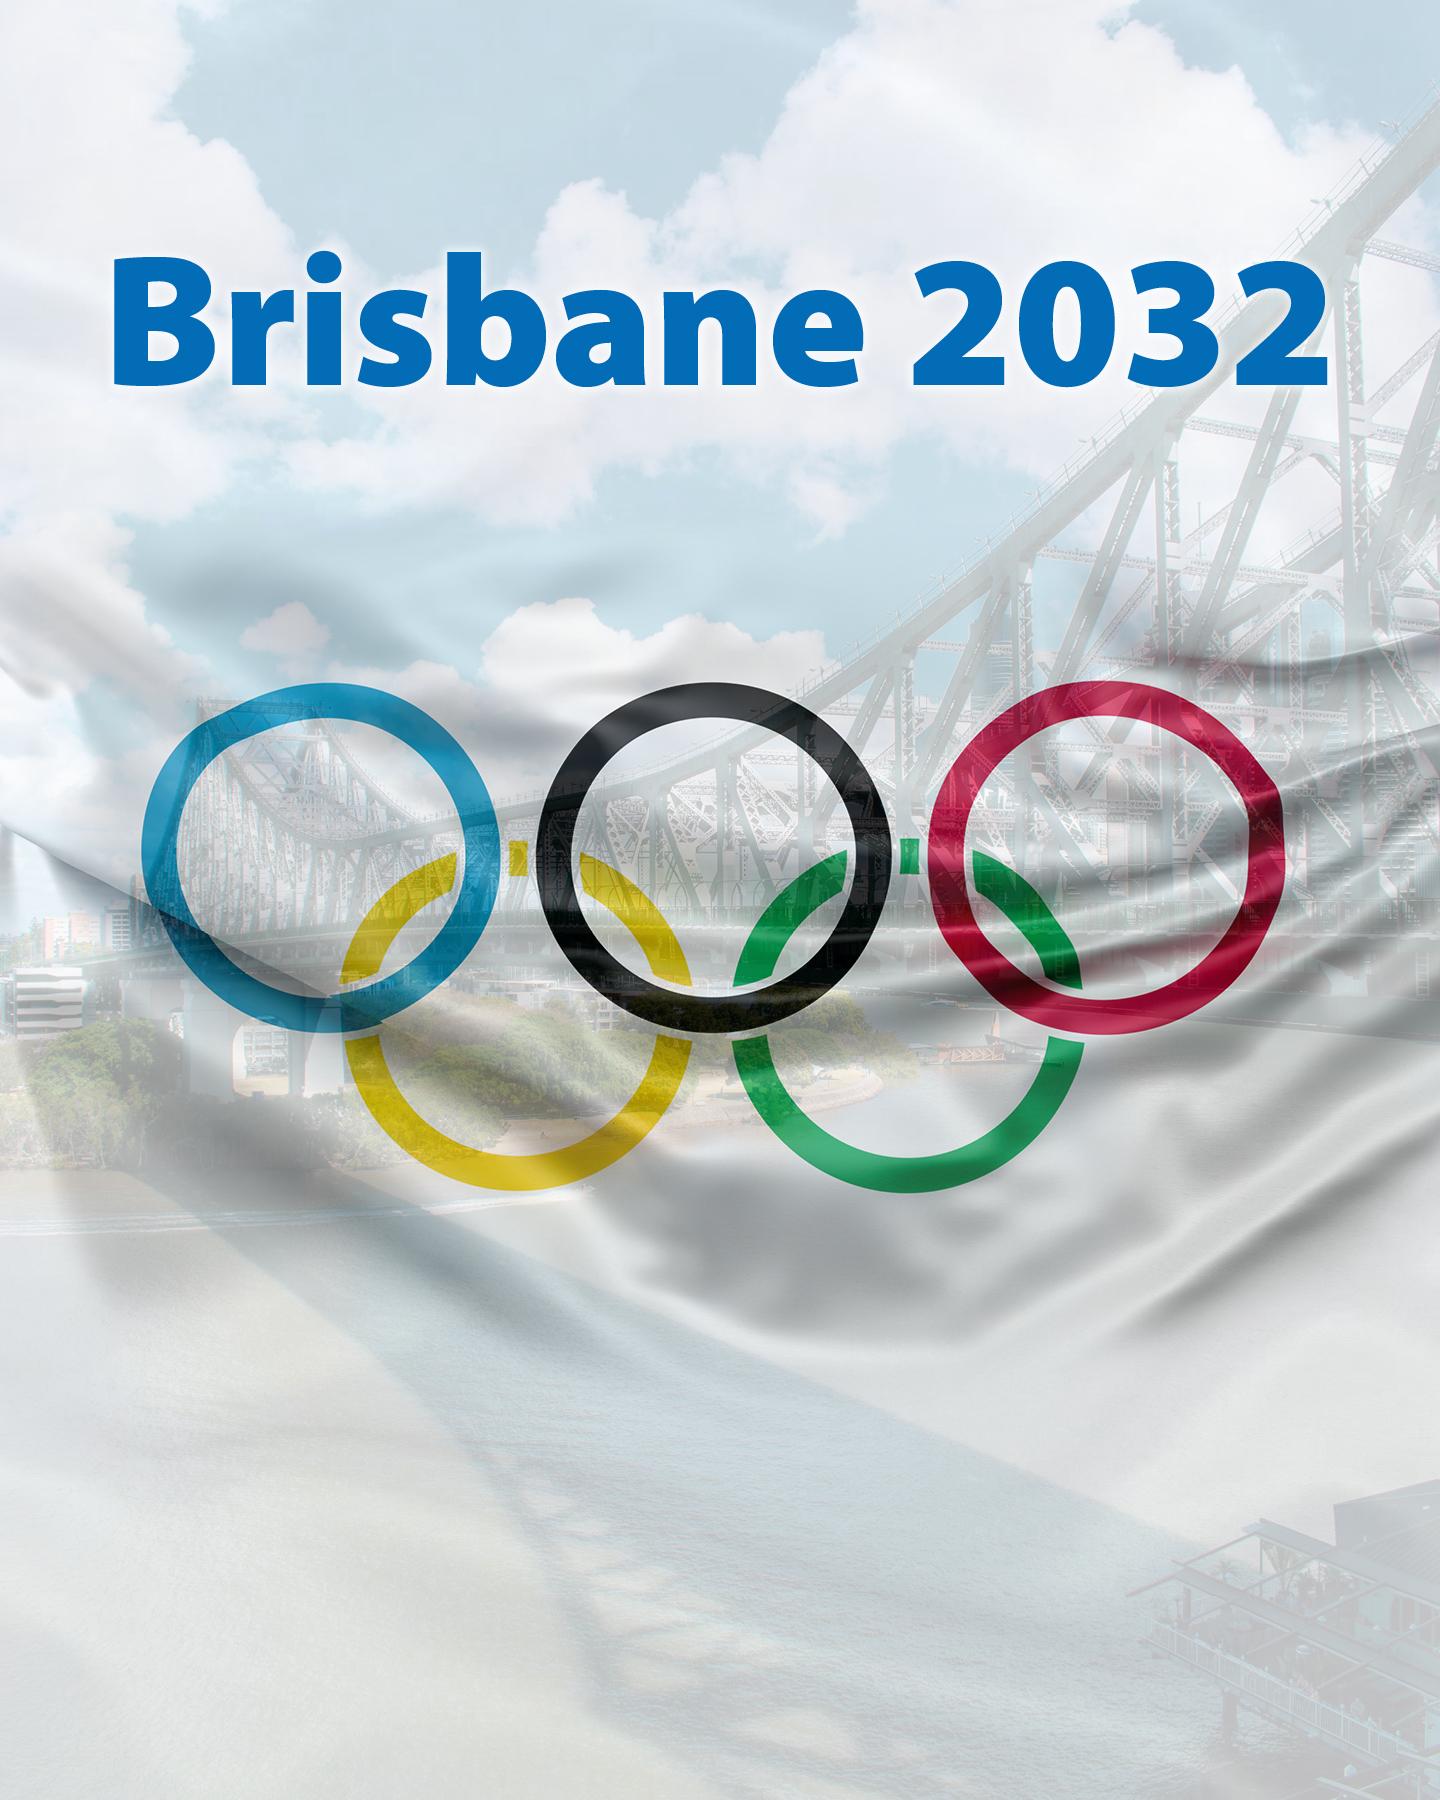 Brisbane 2032